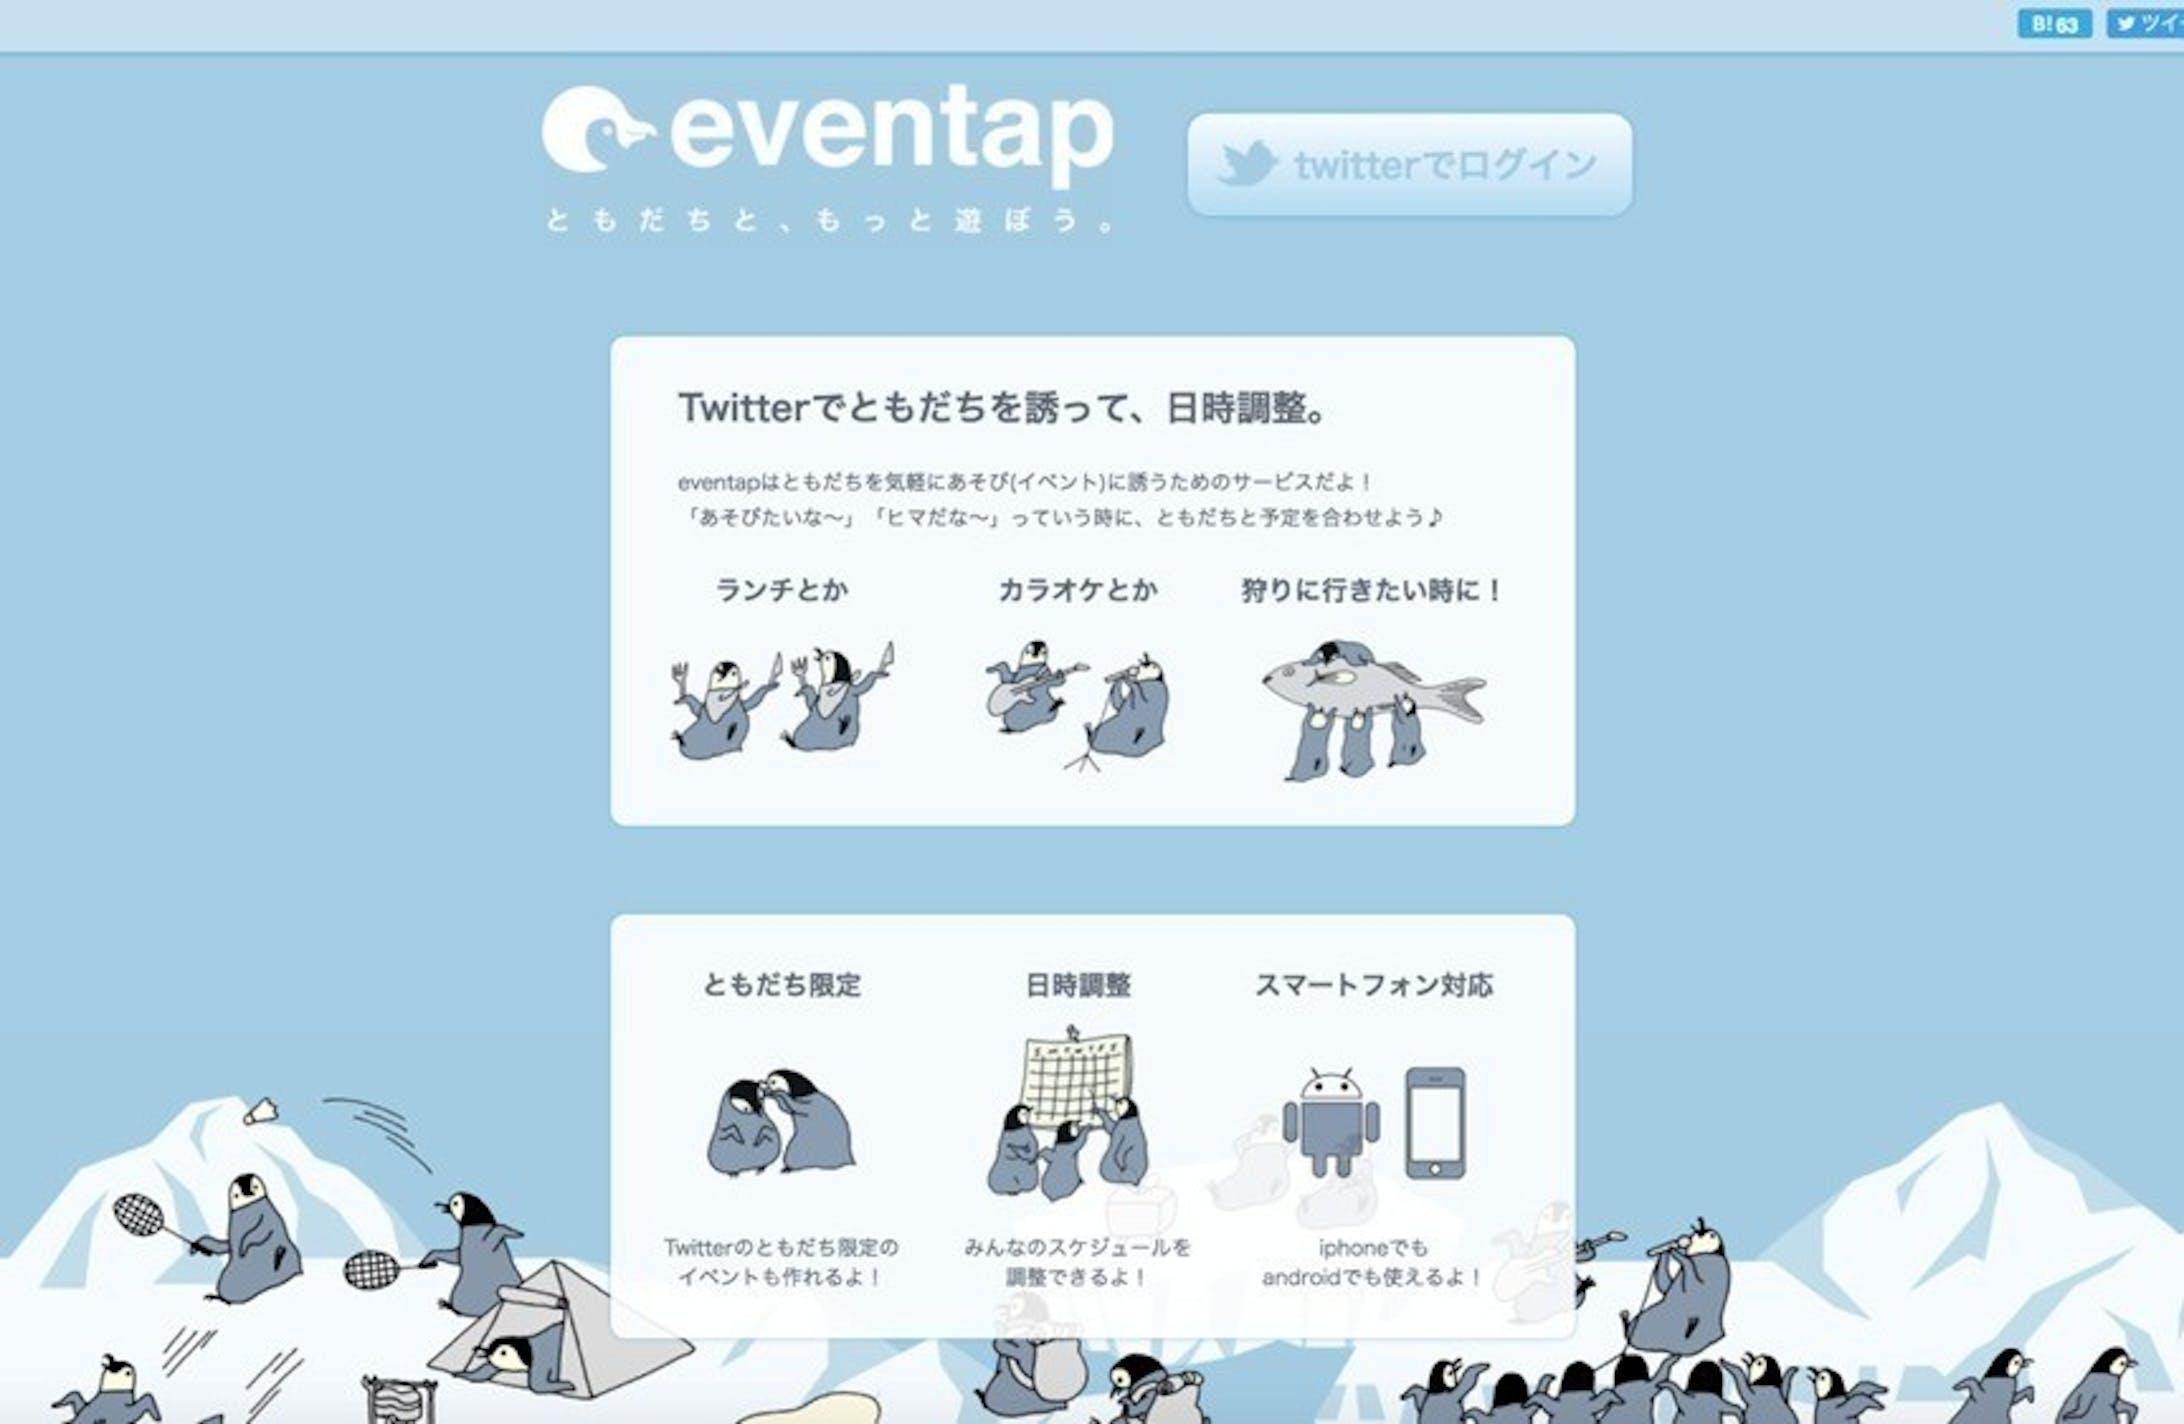 eventap-1